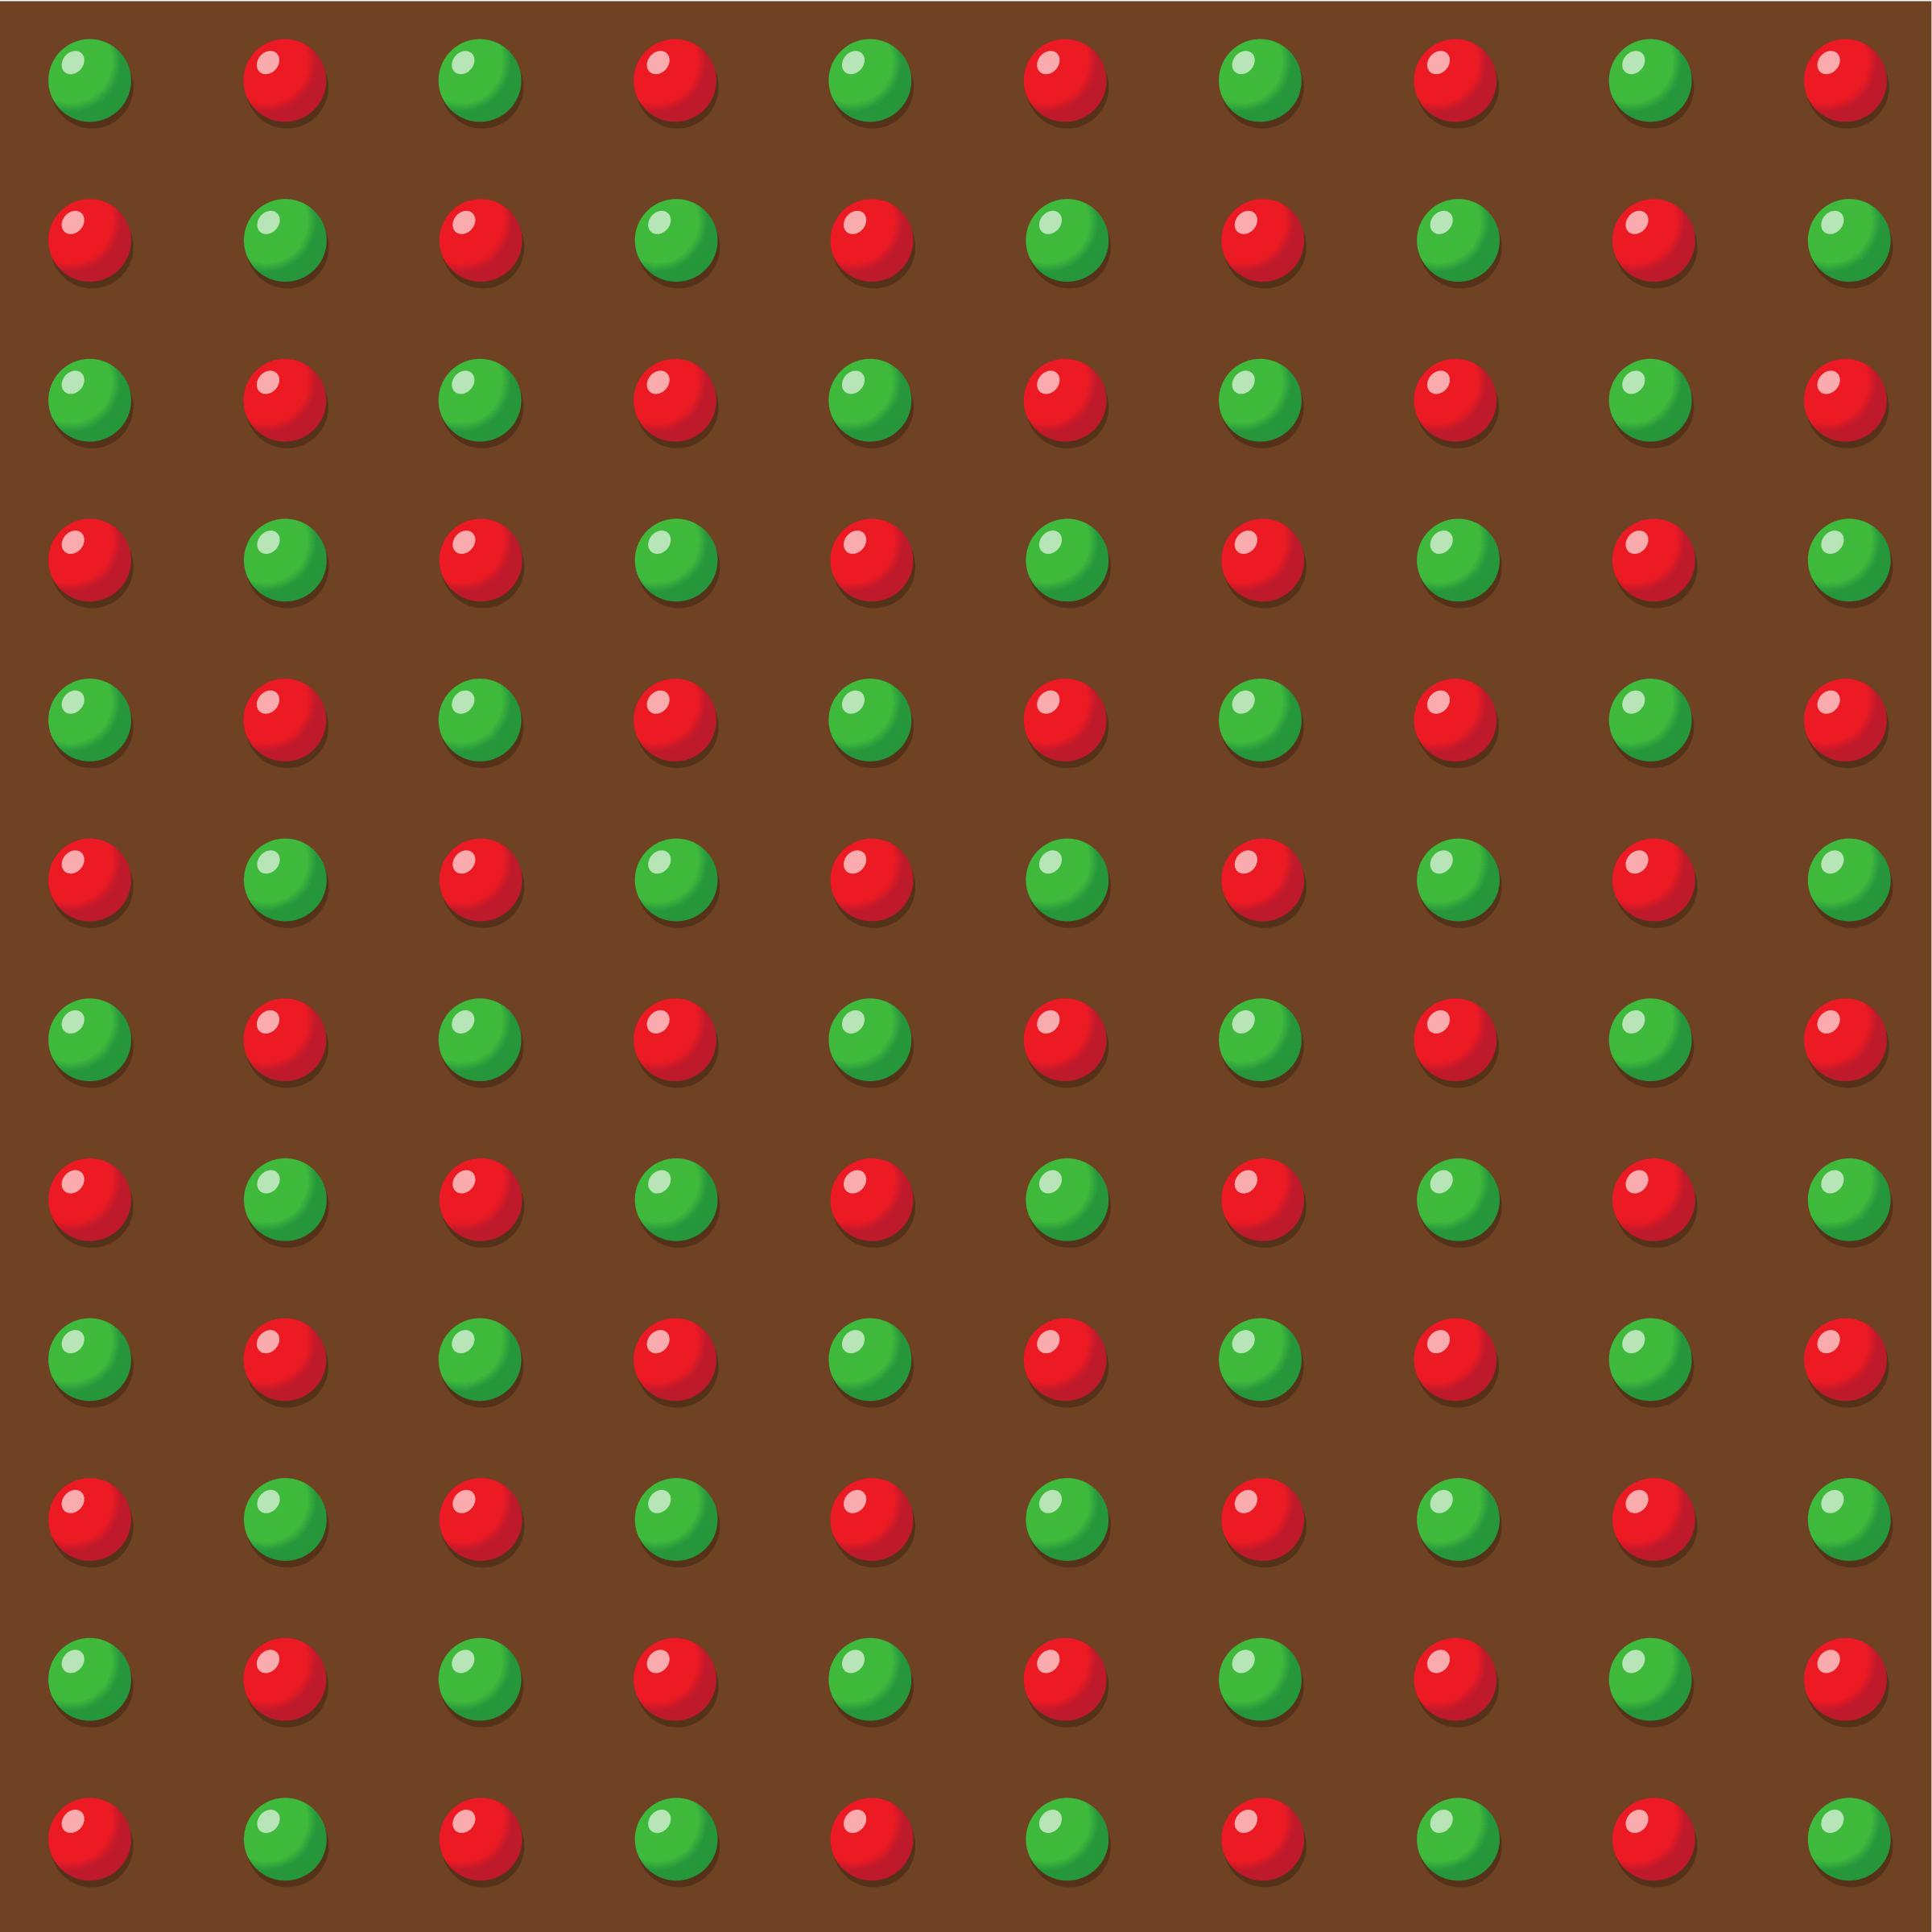 gingerbread-candies-dark-1